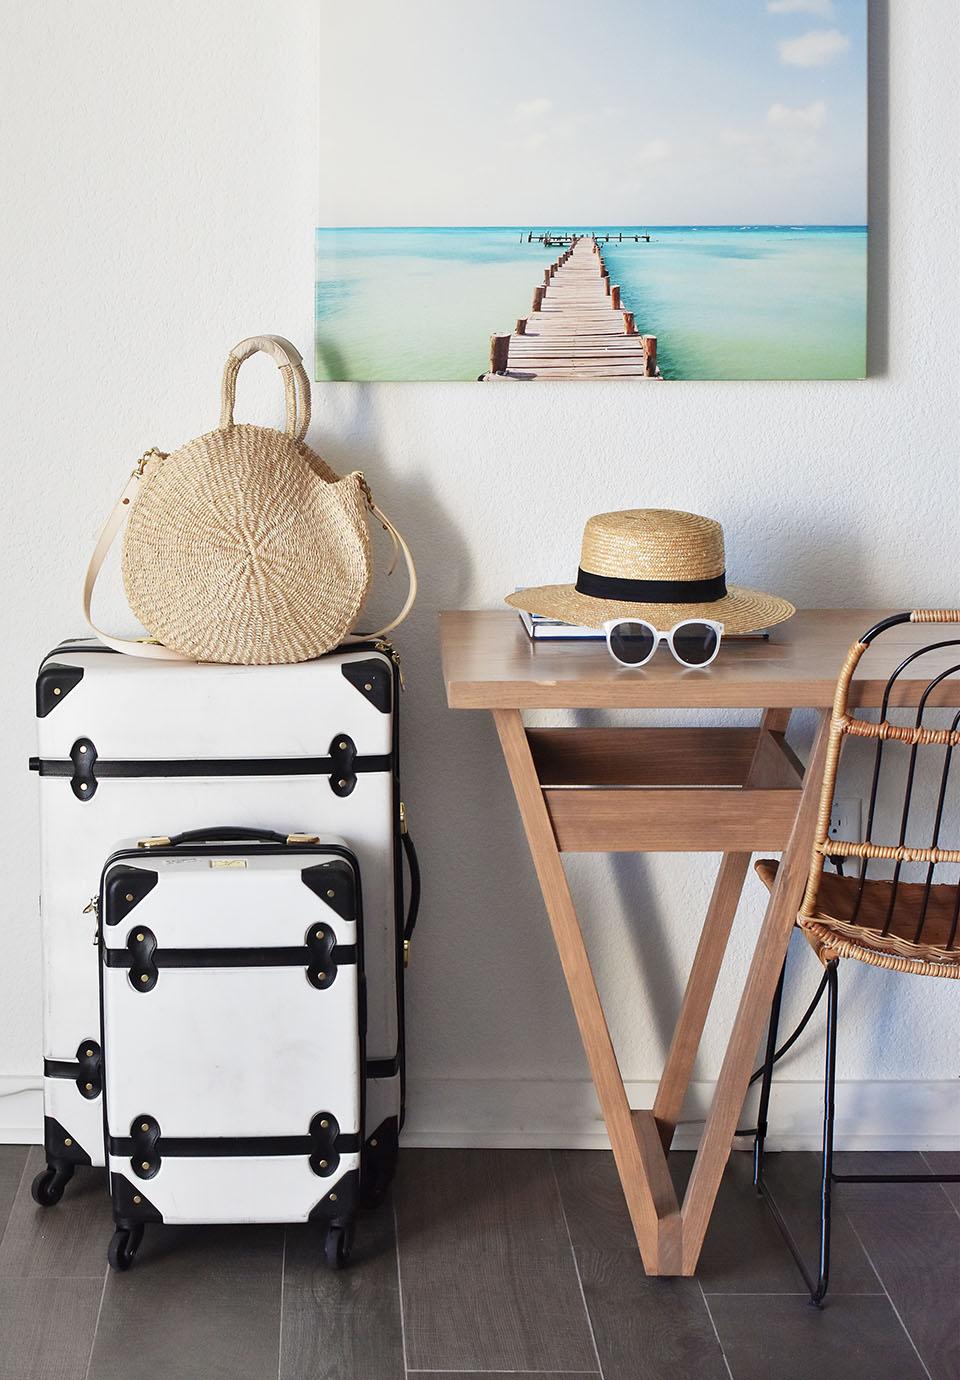 Amara Cay Resort Islamorada - Room Detail - Jami Ray Travels